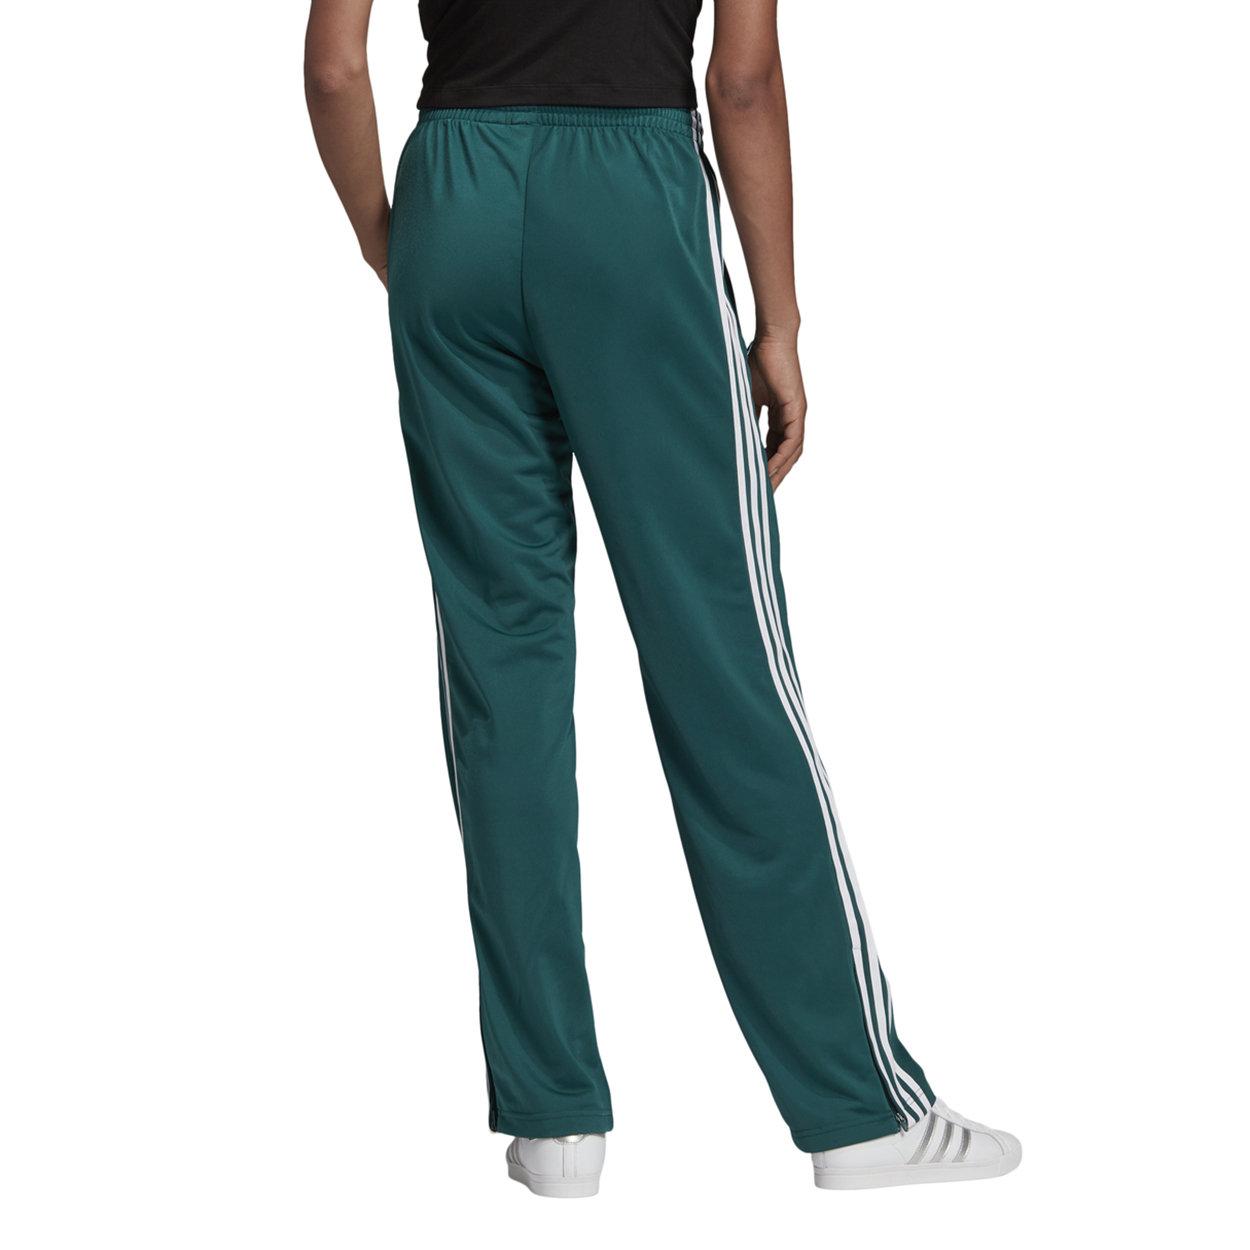 pantaloni adidas bambino verdi